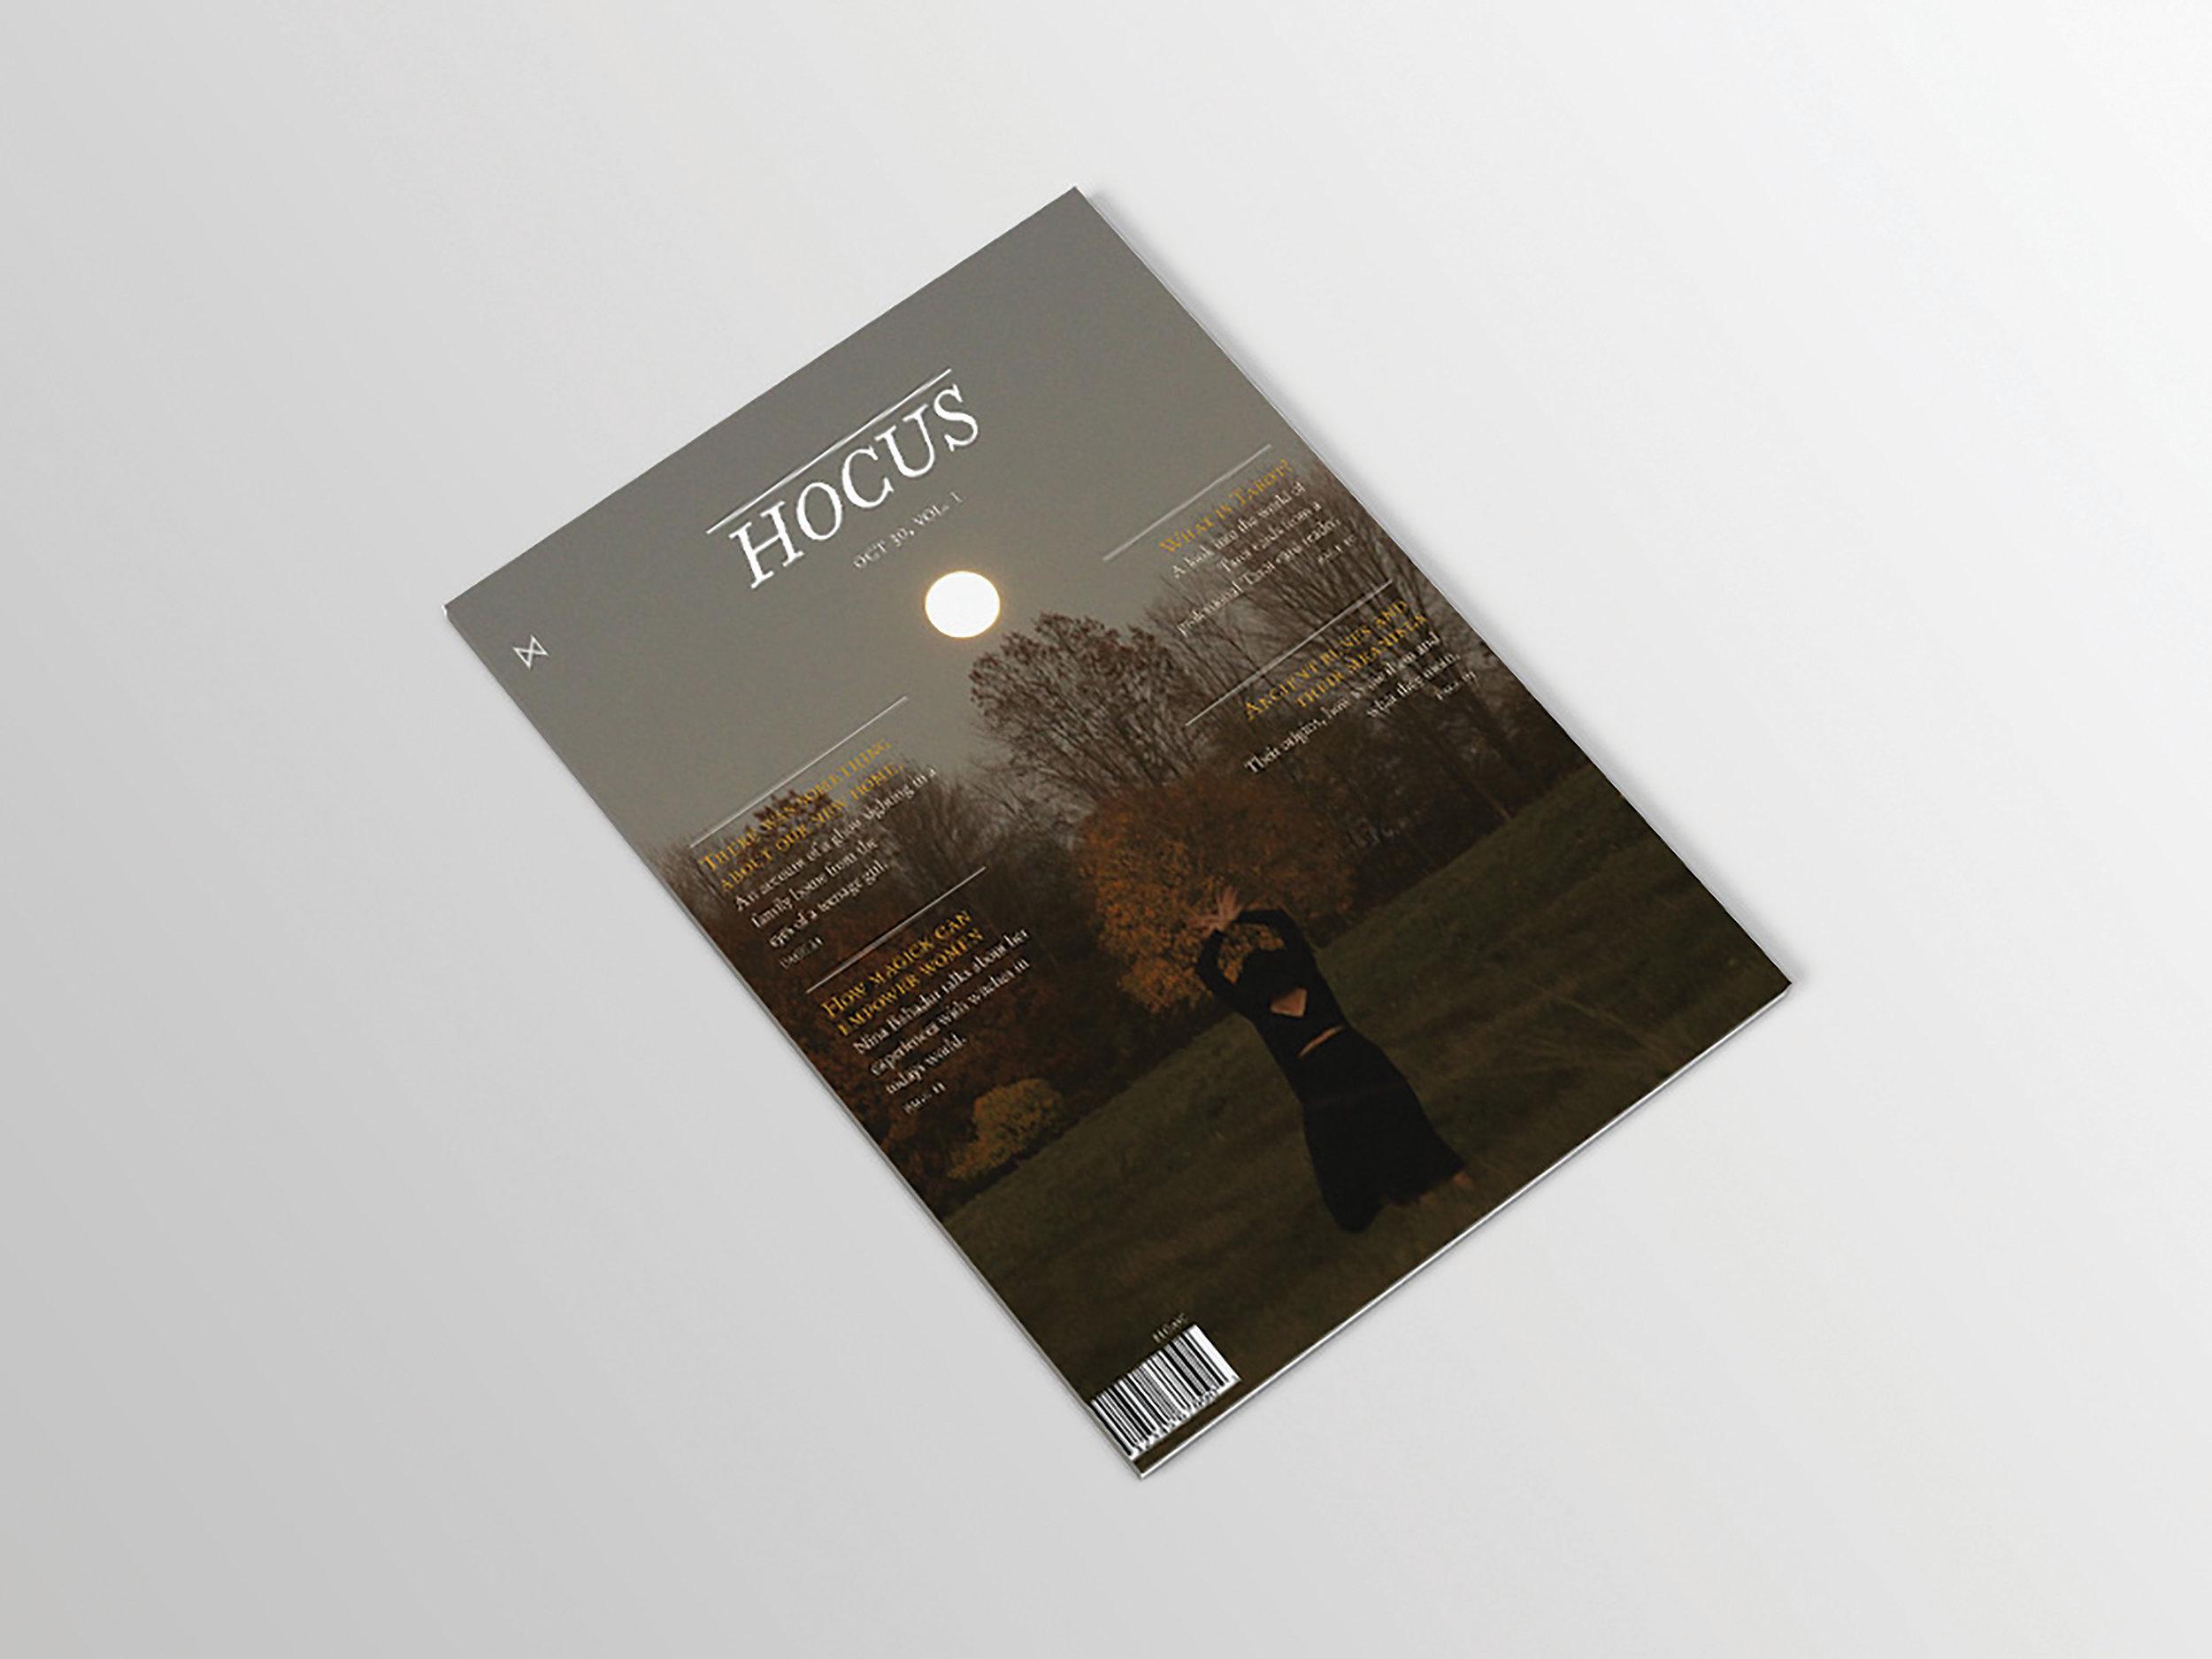 cover1 copy.jpg